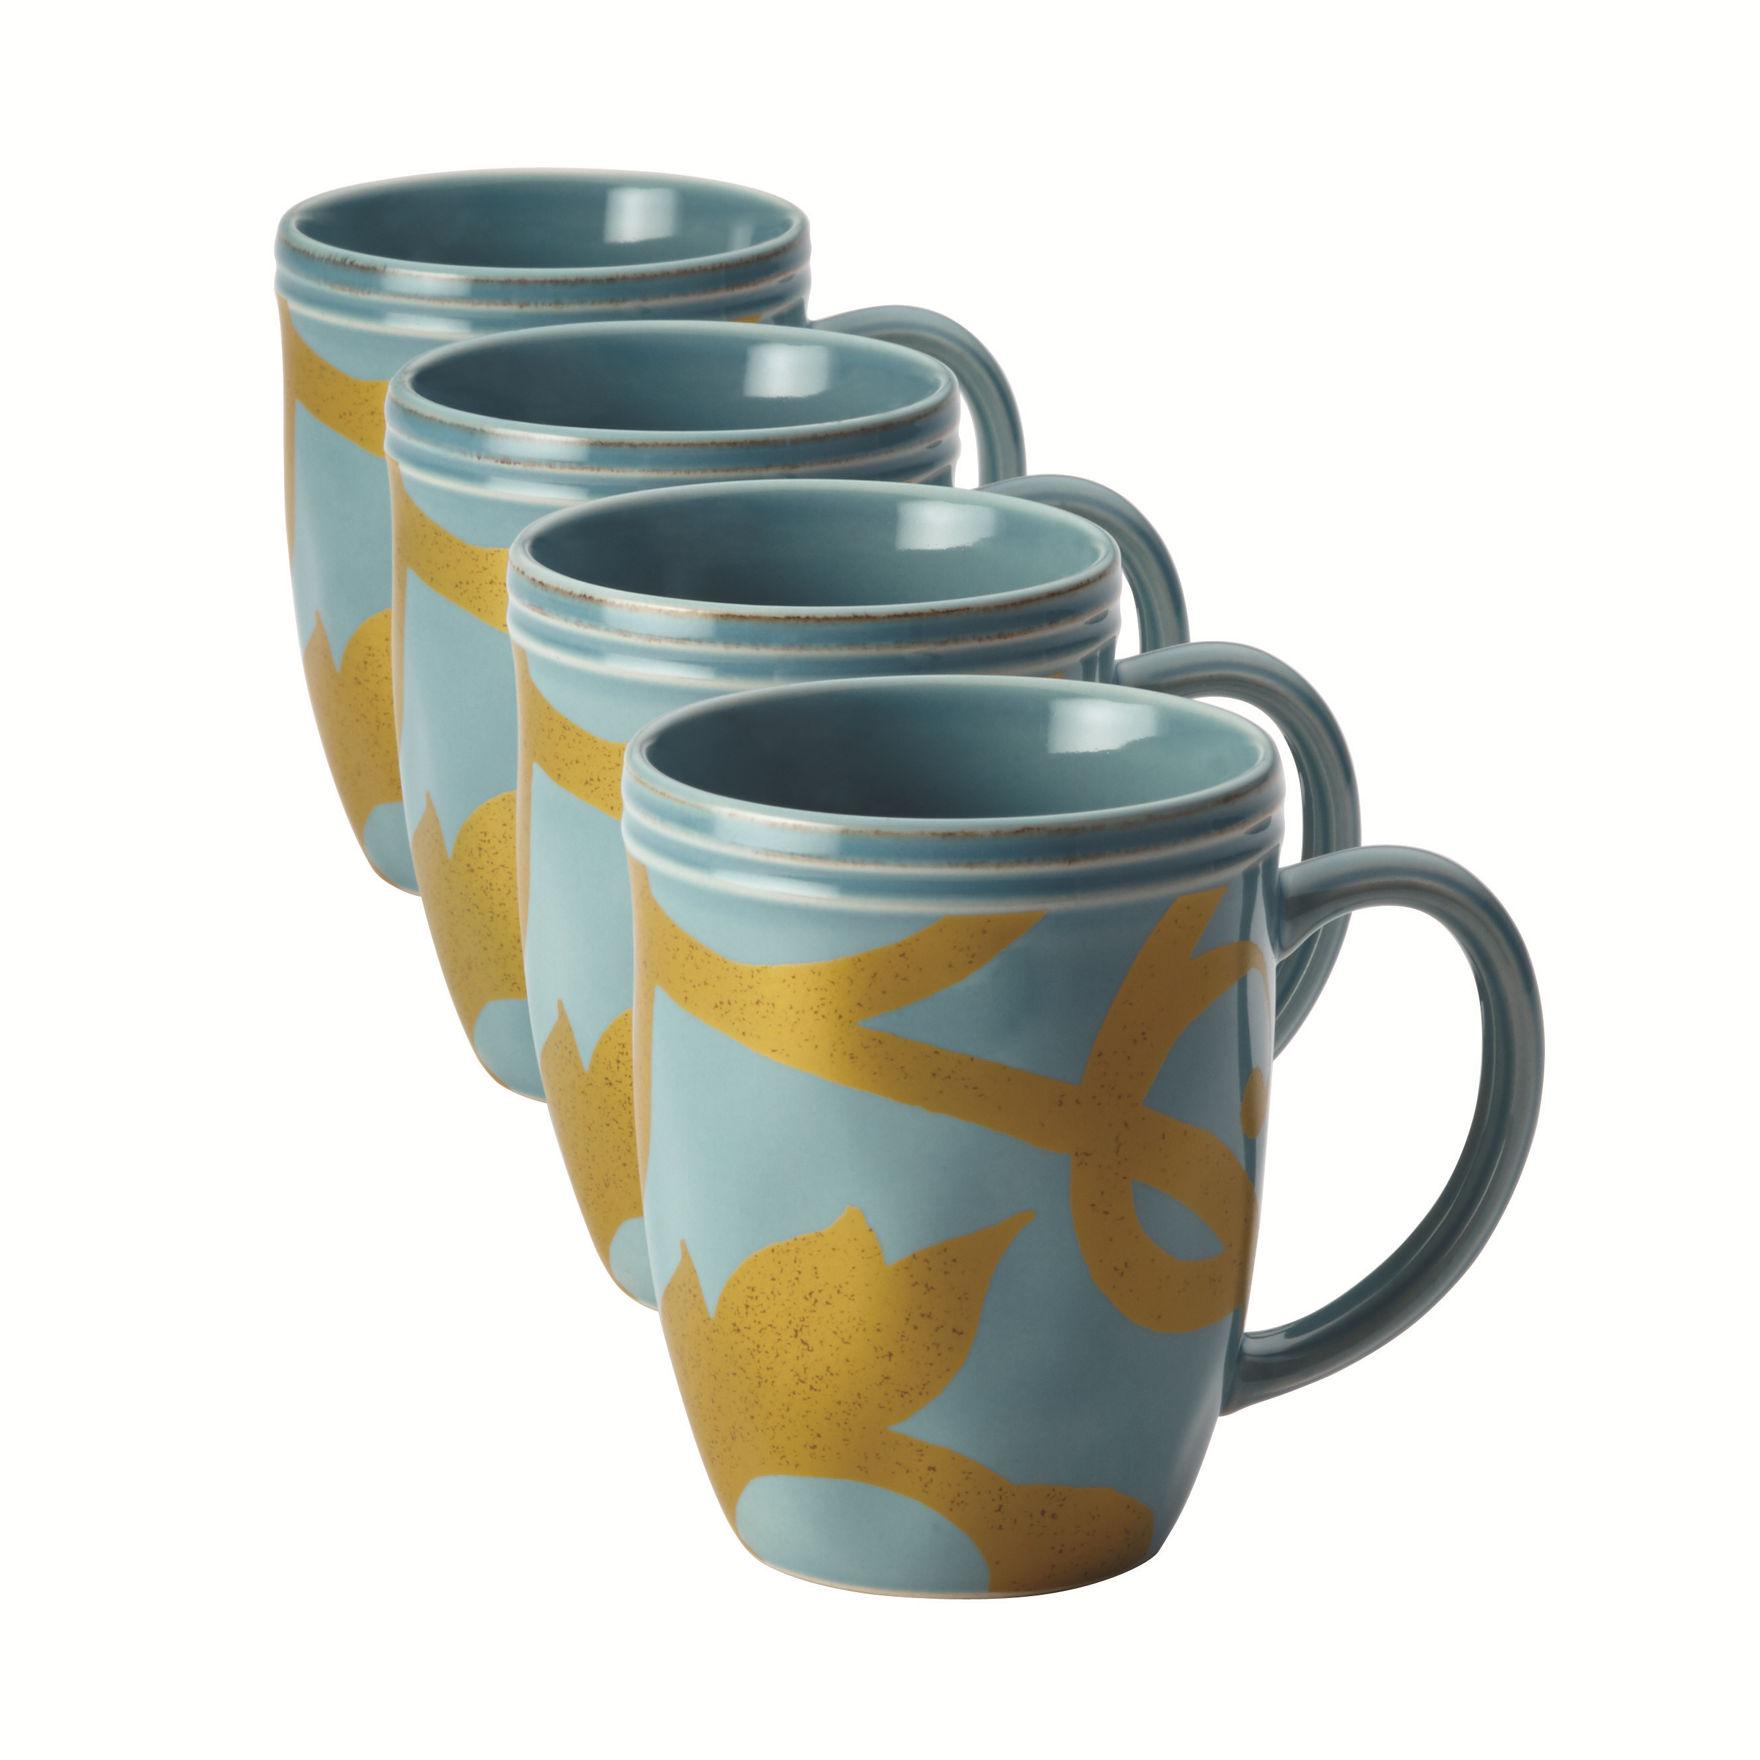 Rachael Ray Blue Mugs Drinkware